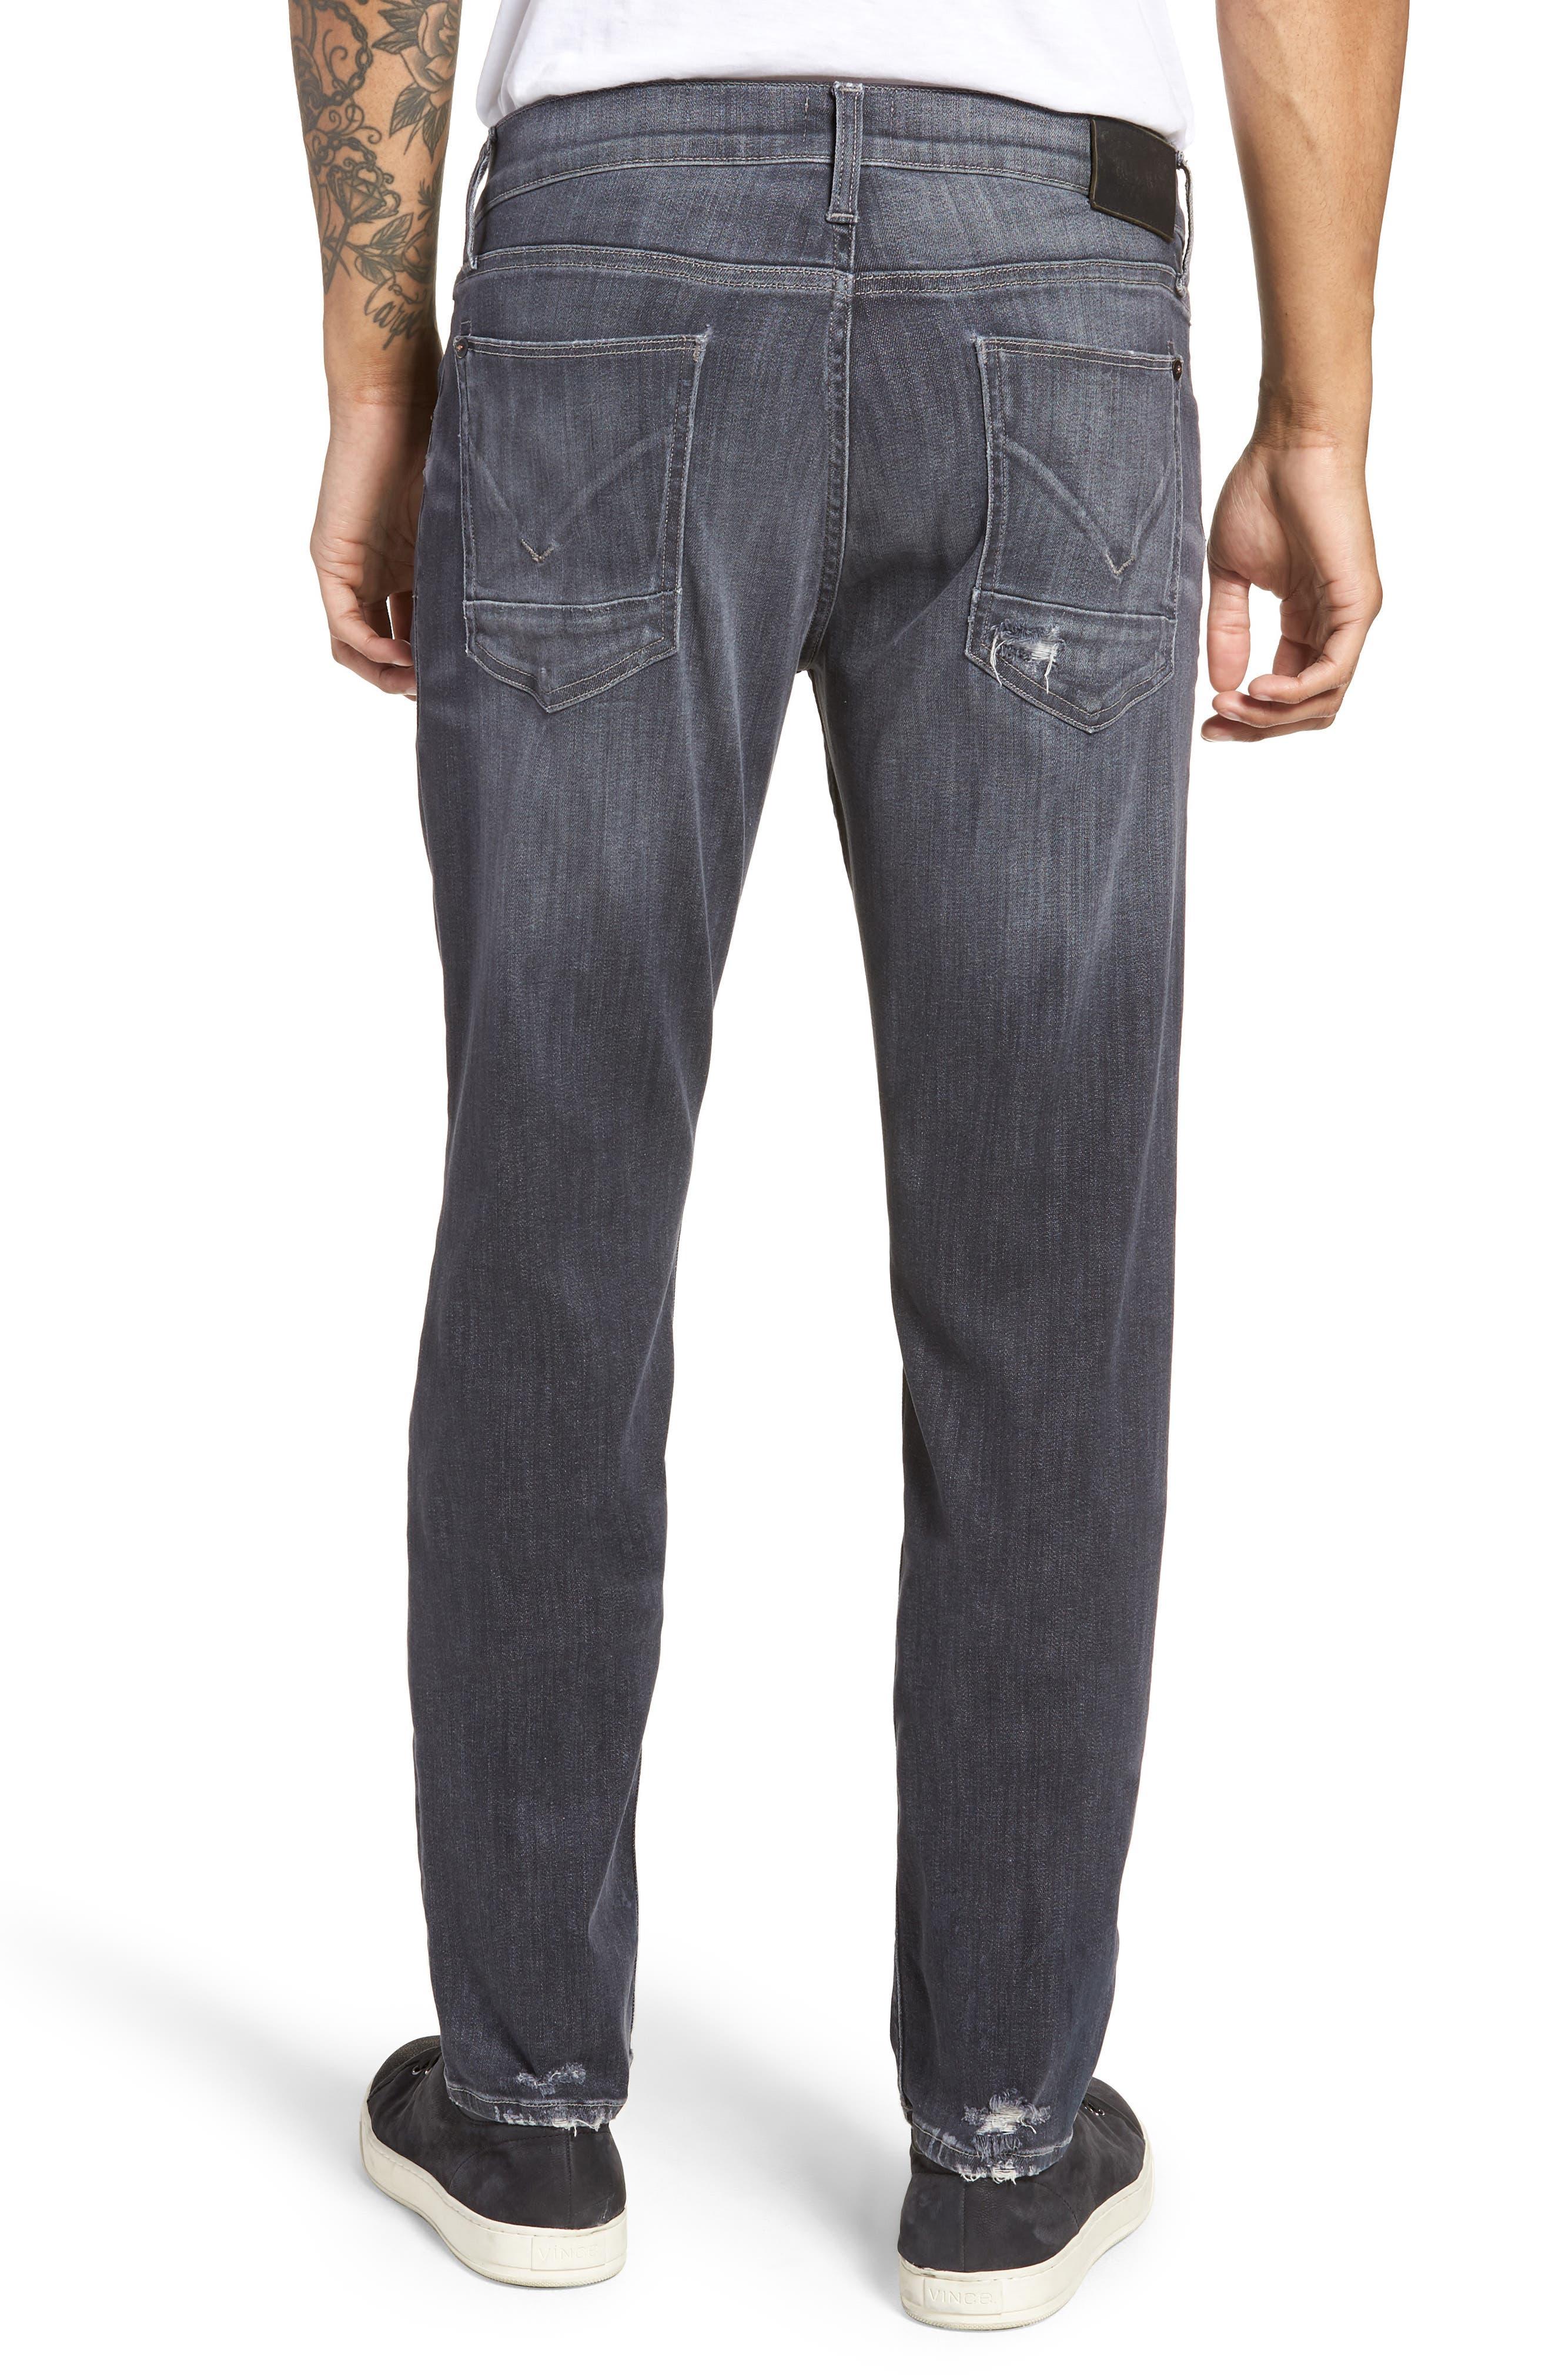 Blake Slim Fit Jeans,                             Alternate thumbnail 2, color,                             Silver Lake